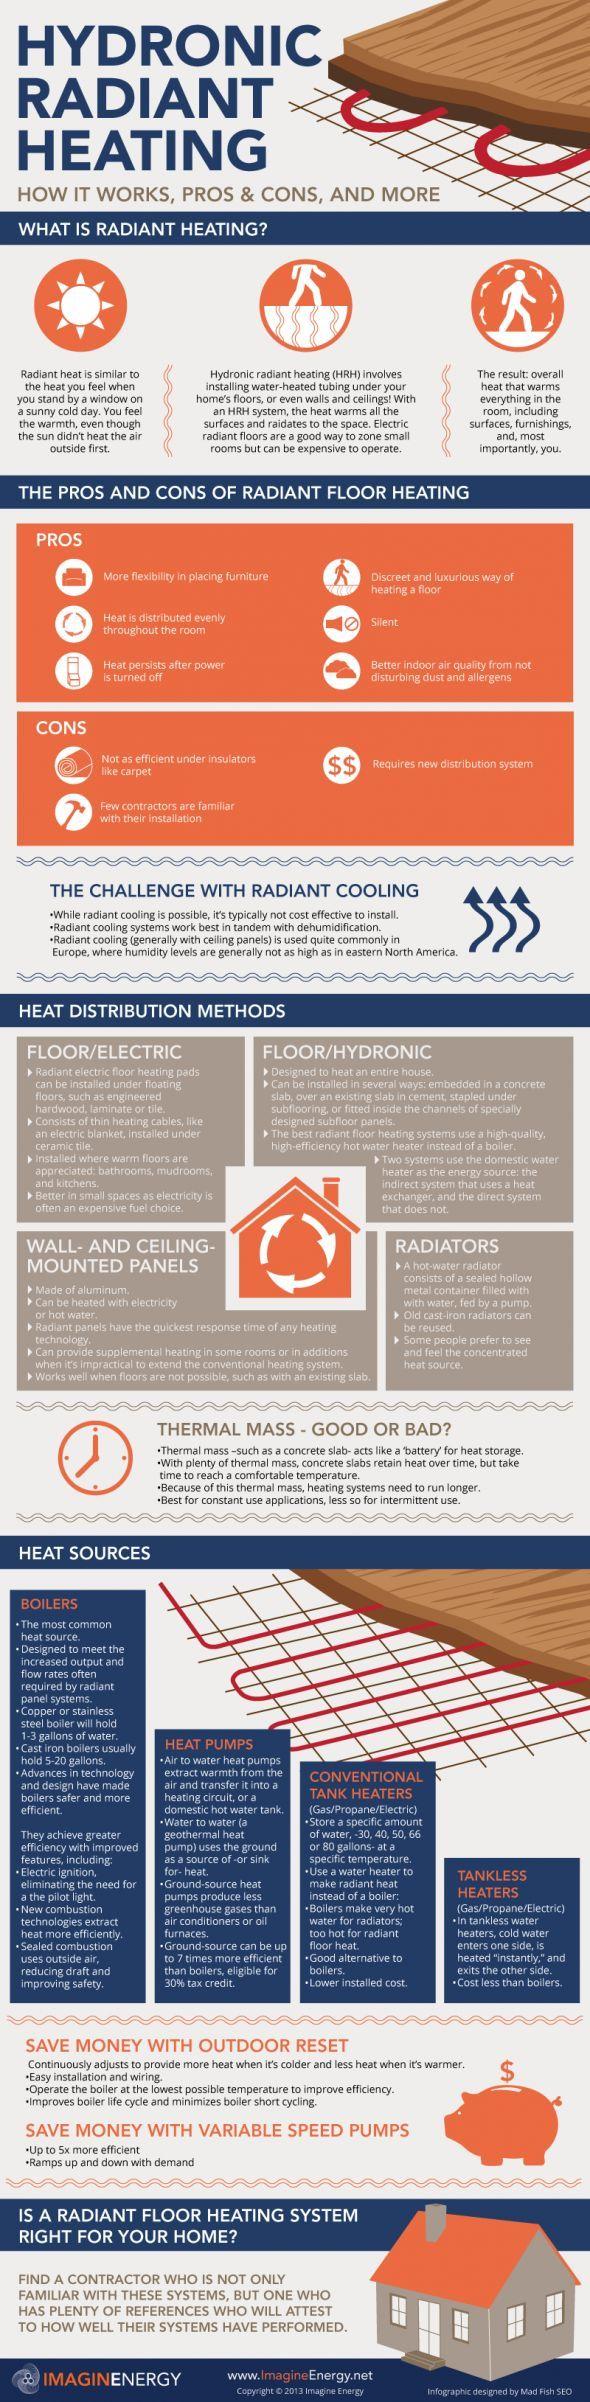 Radiant Heating - ImagineEnergy - Sebring Services